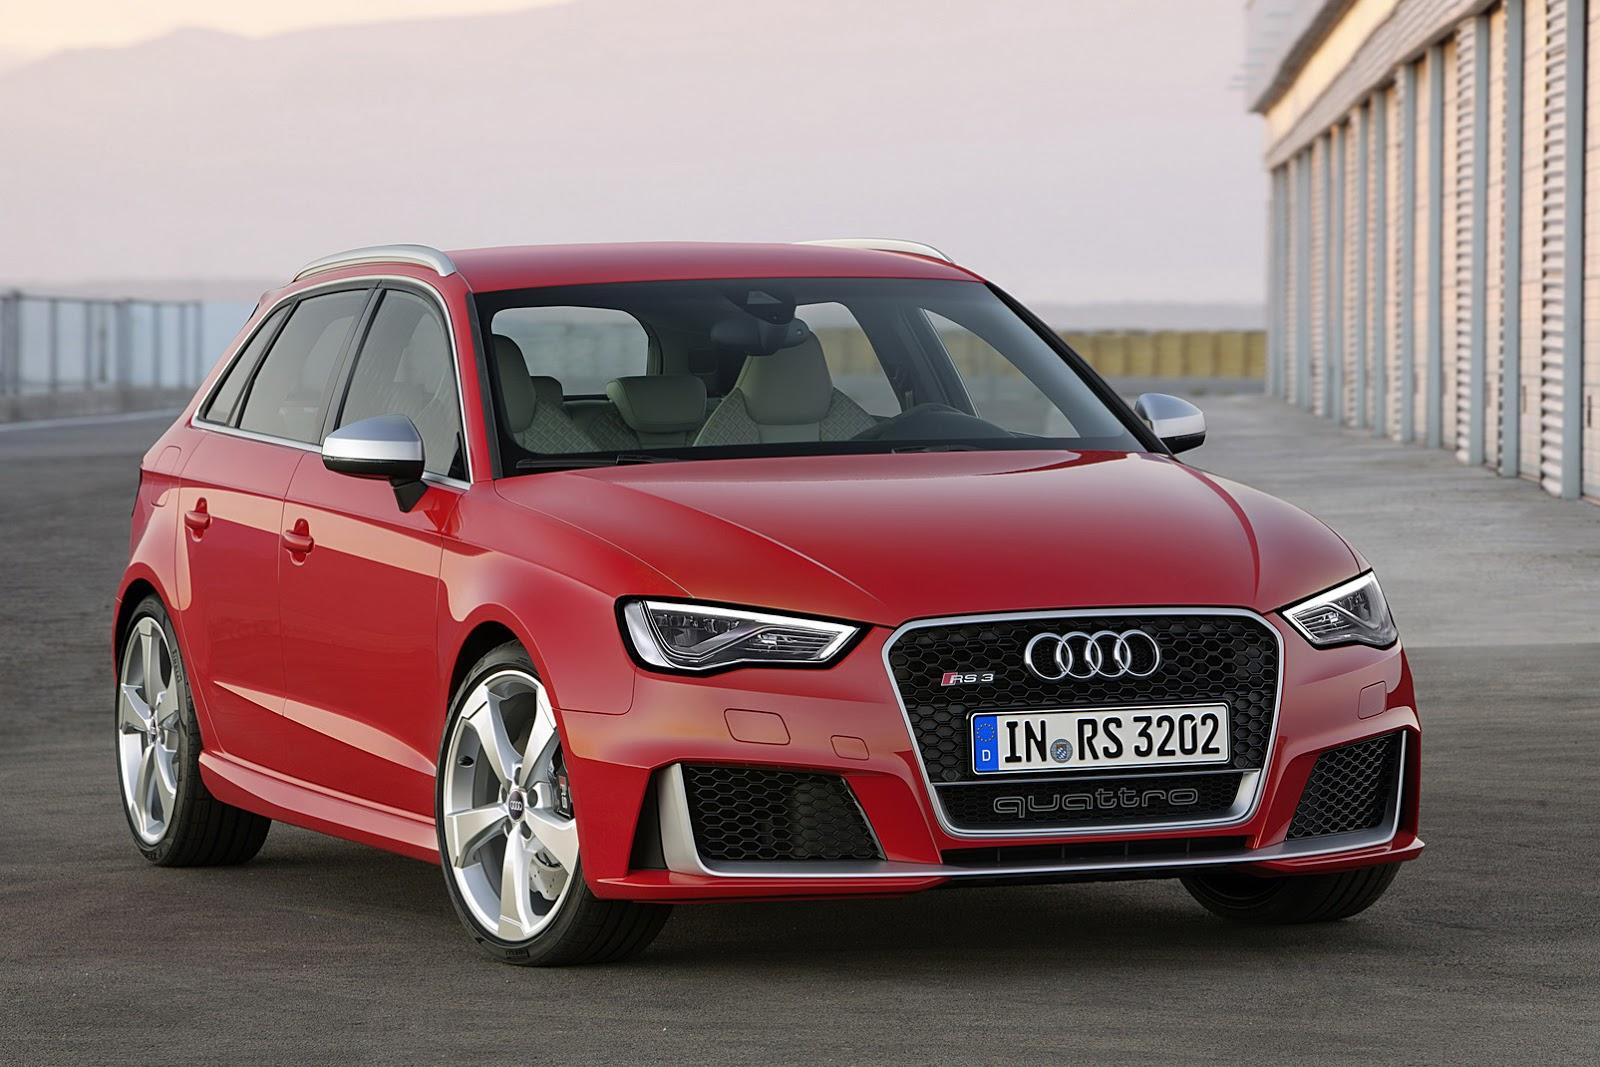 New-Audi-RS-3-Sportback-1